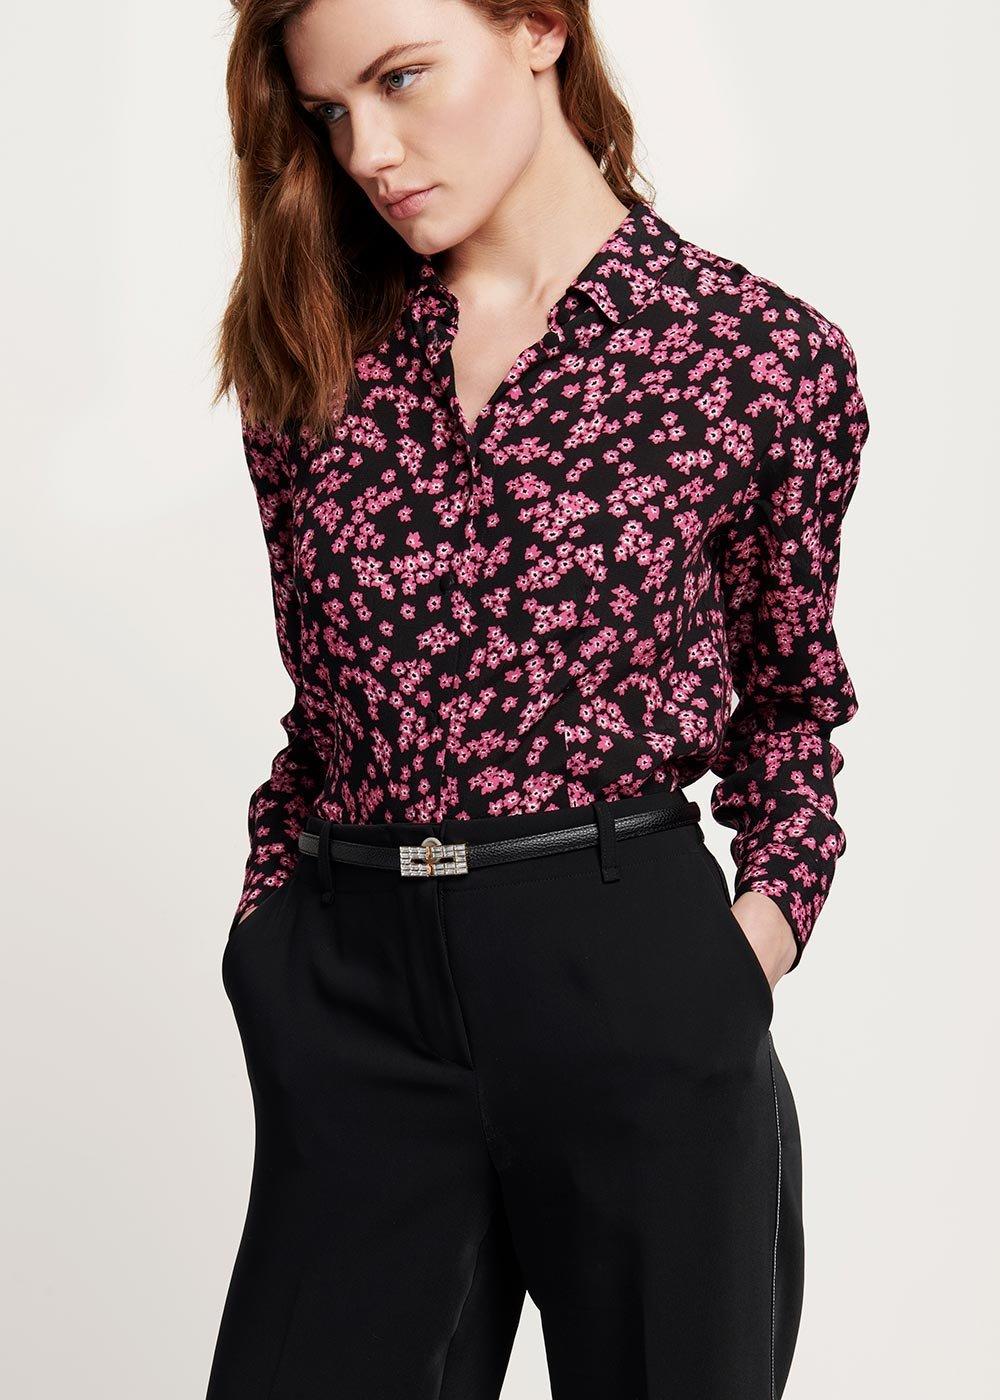 Alessia shirt with flower print - Black Gloss\Fantasia - Woman